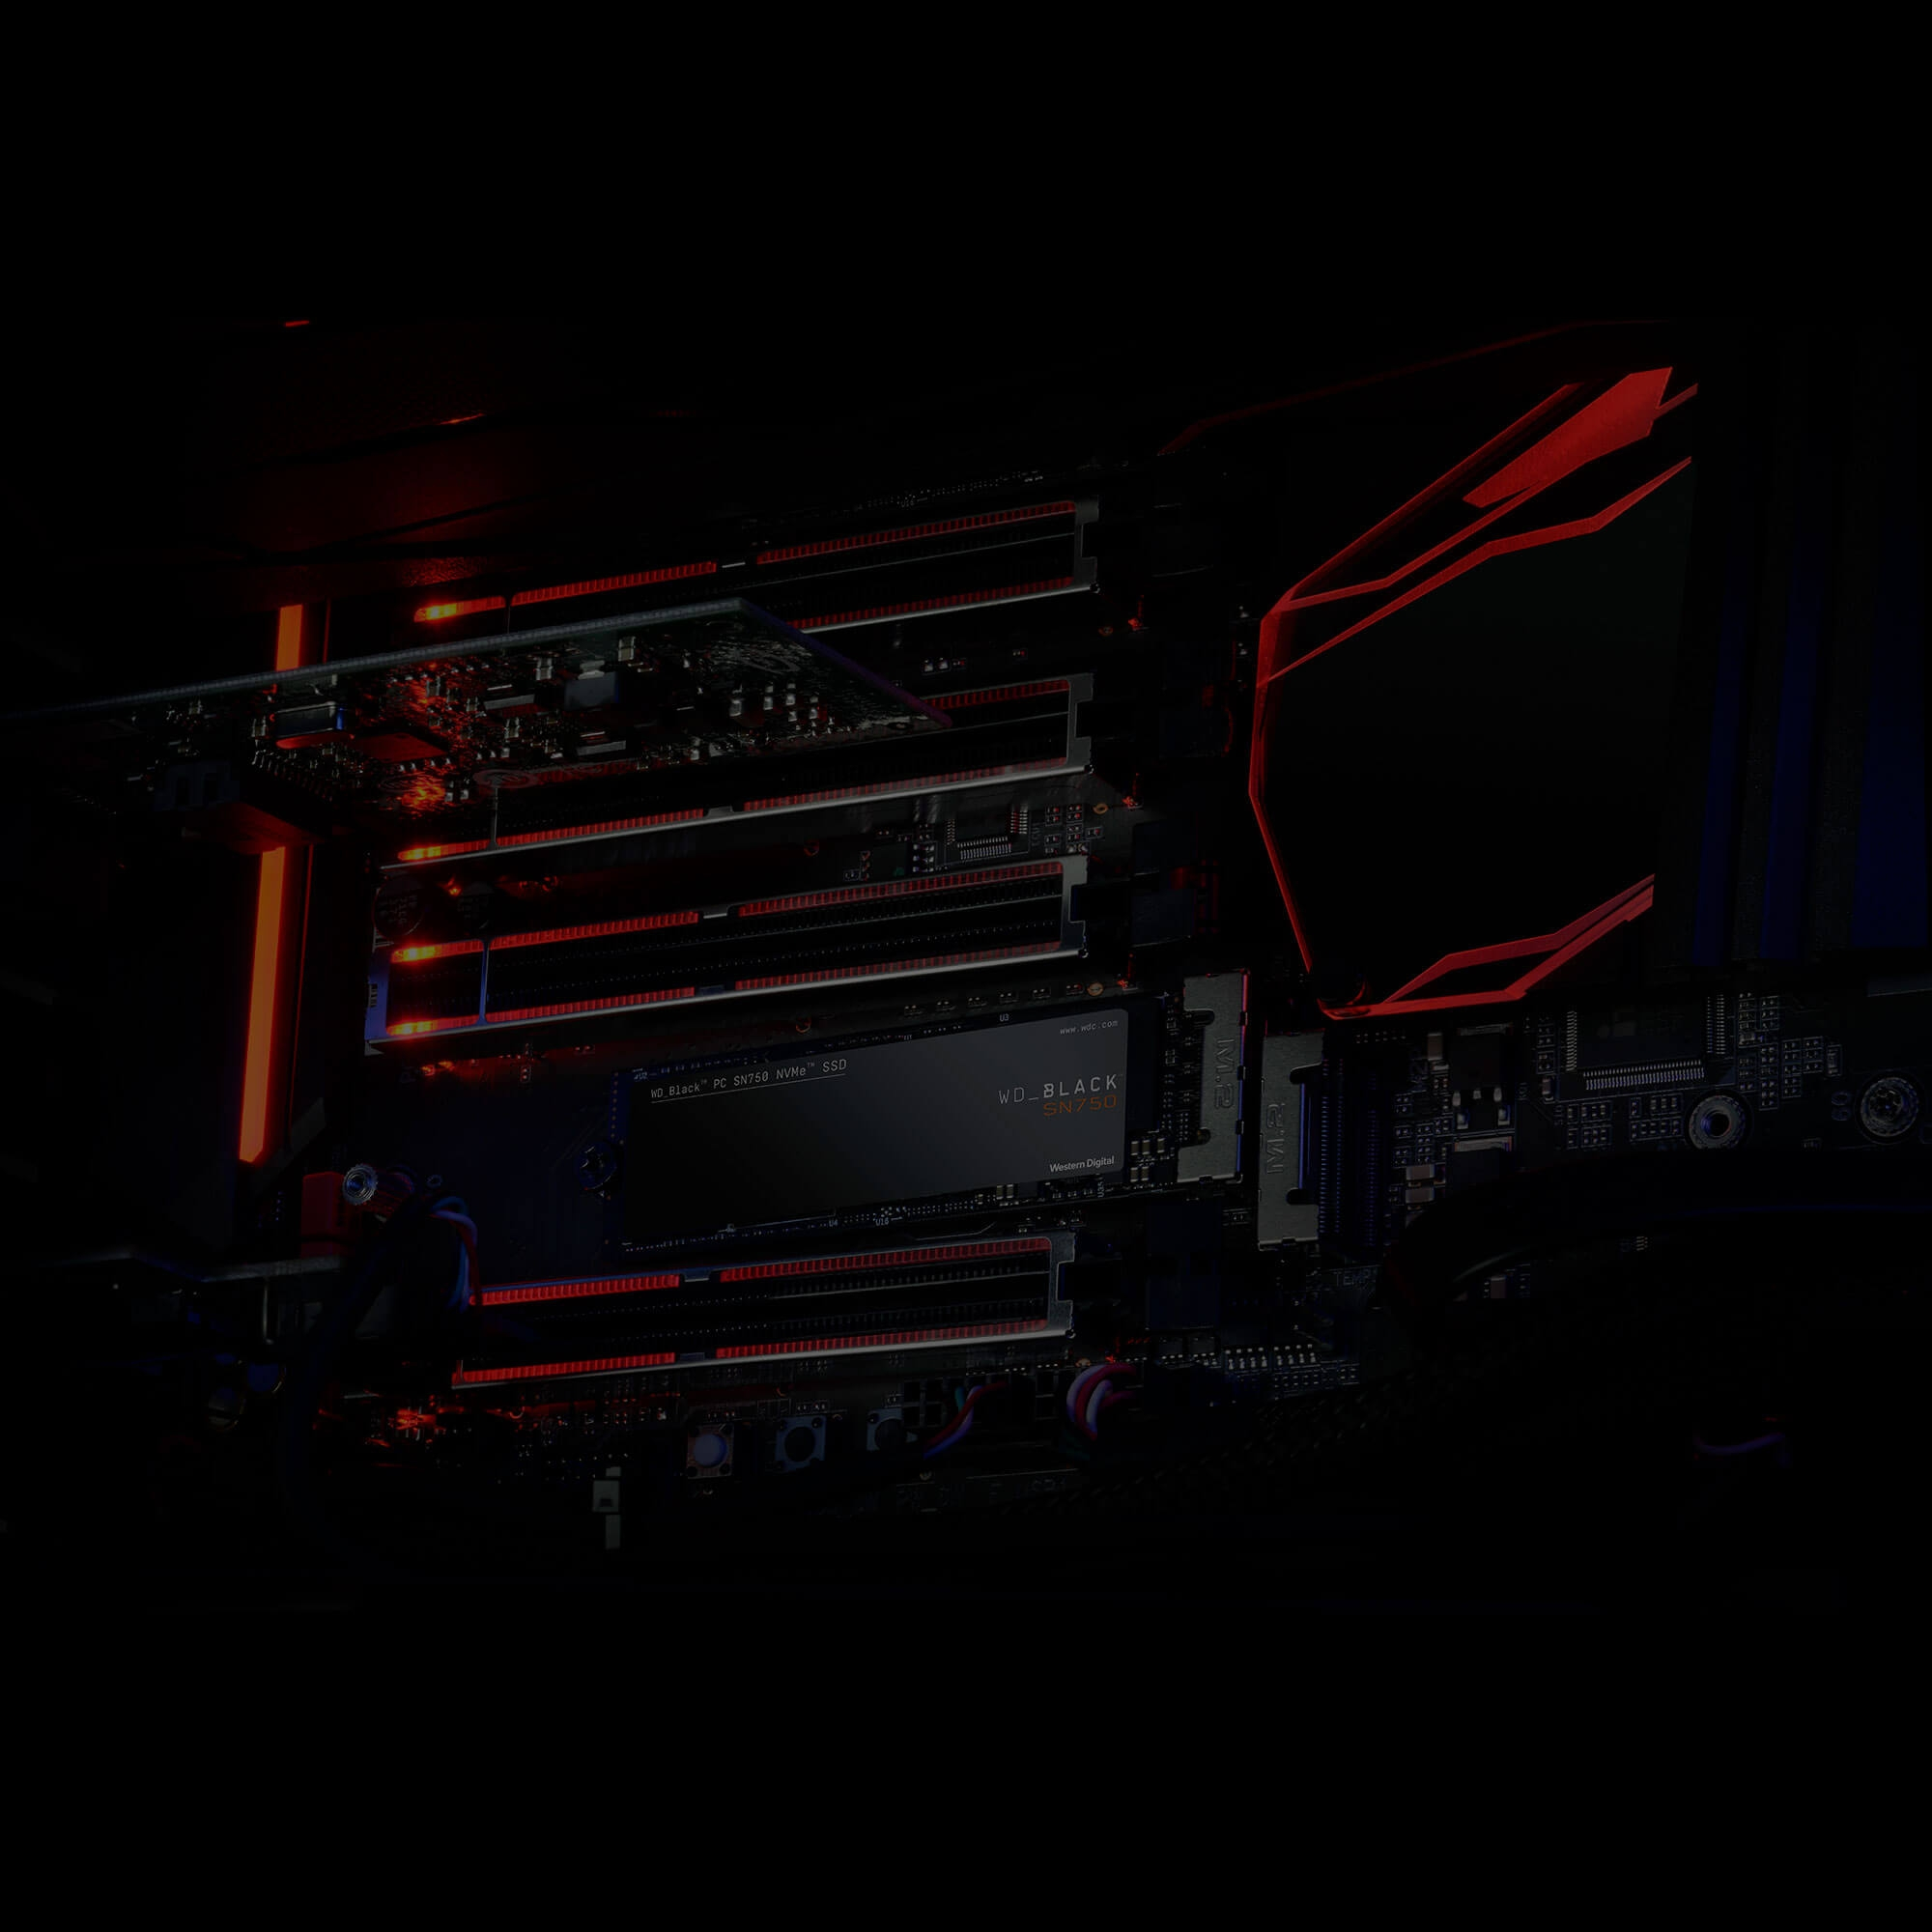 Ổ cứng SSD WD Black 250GB M.2 2280 NVMe PCIe (WDS250G3X0C)_2